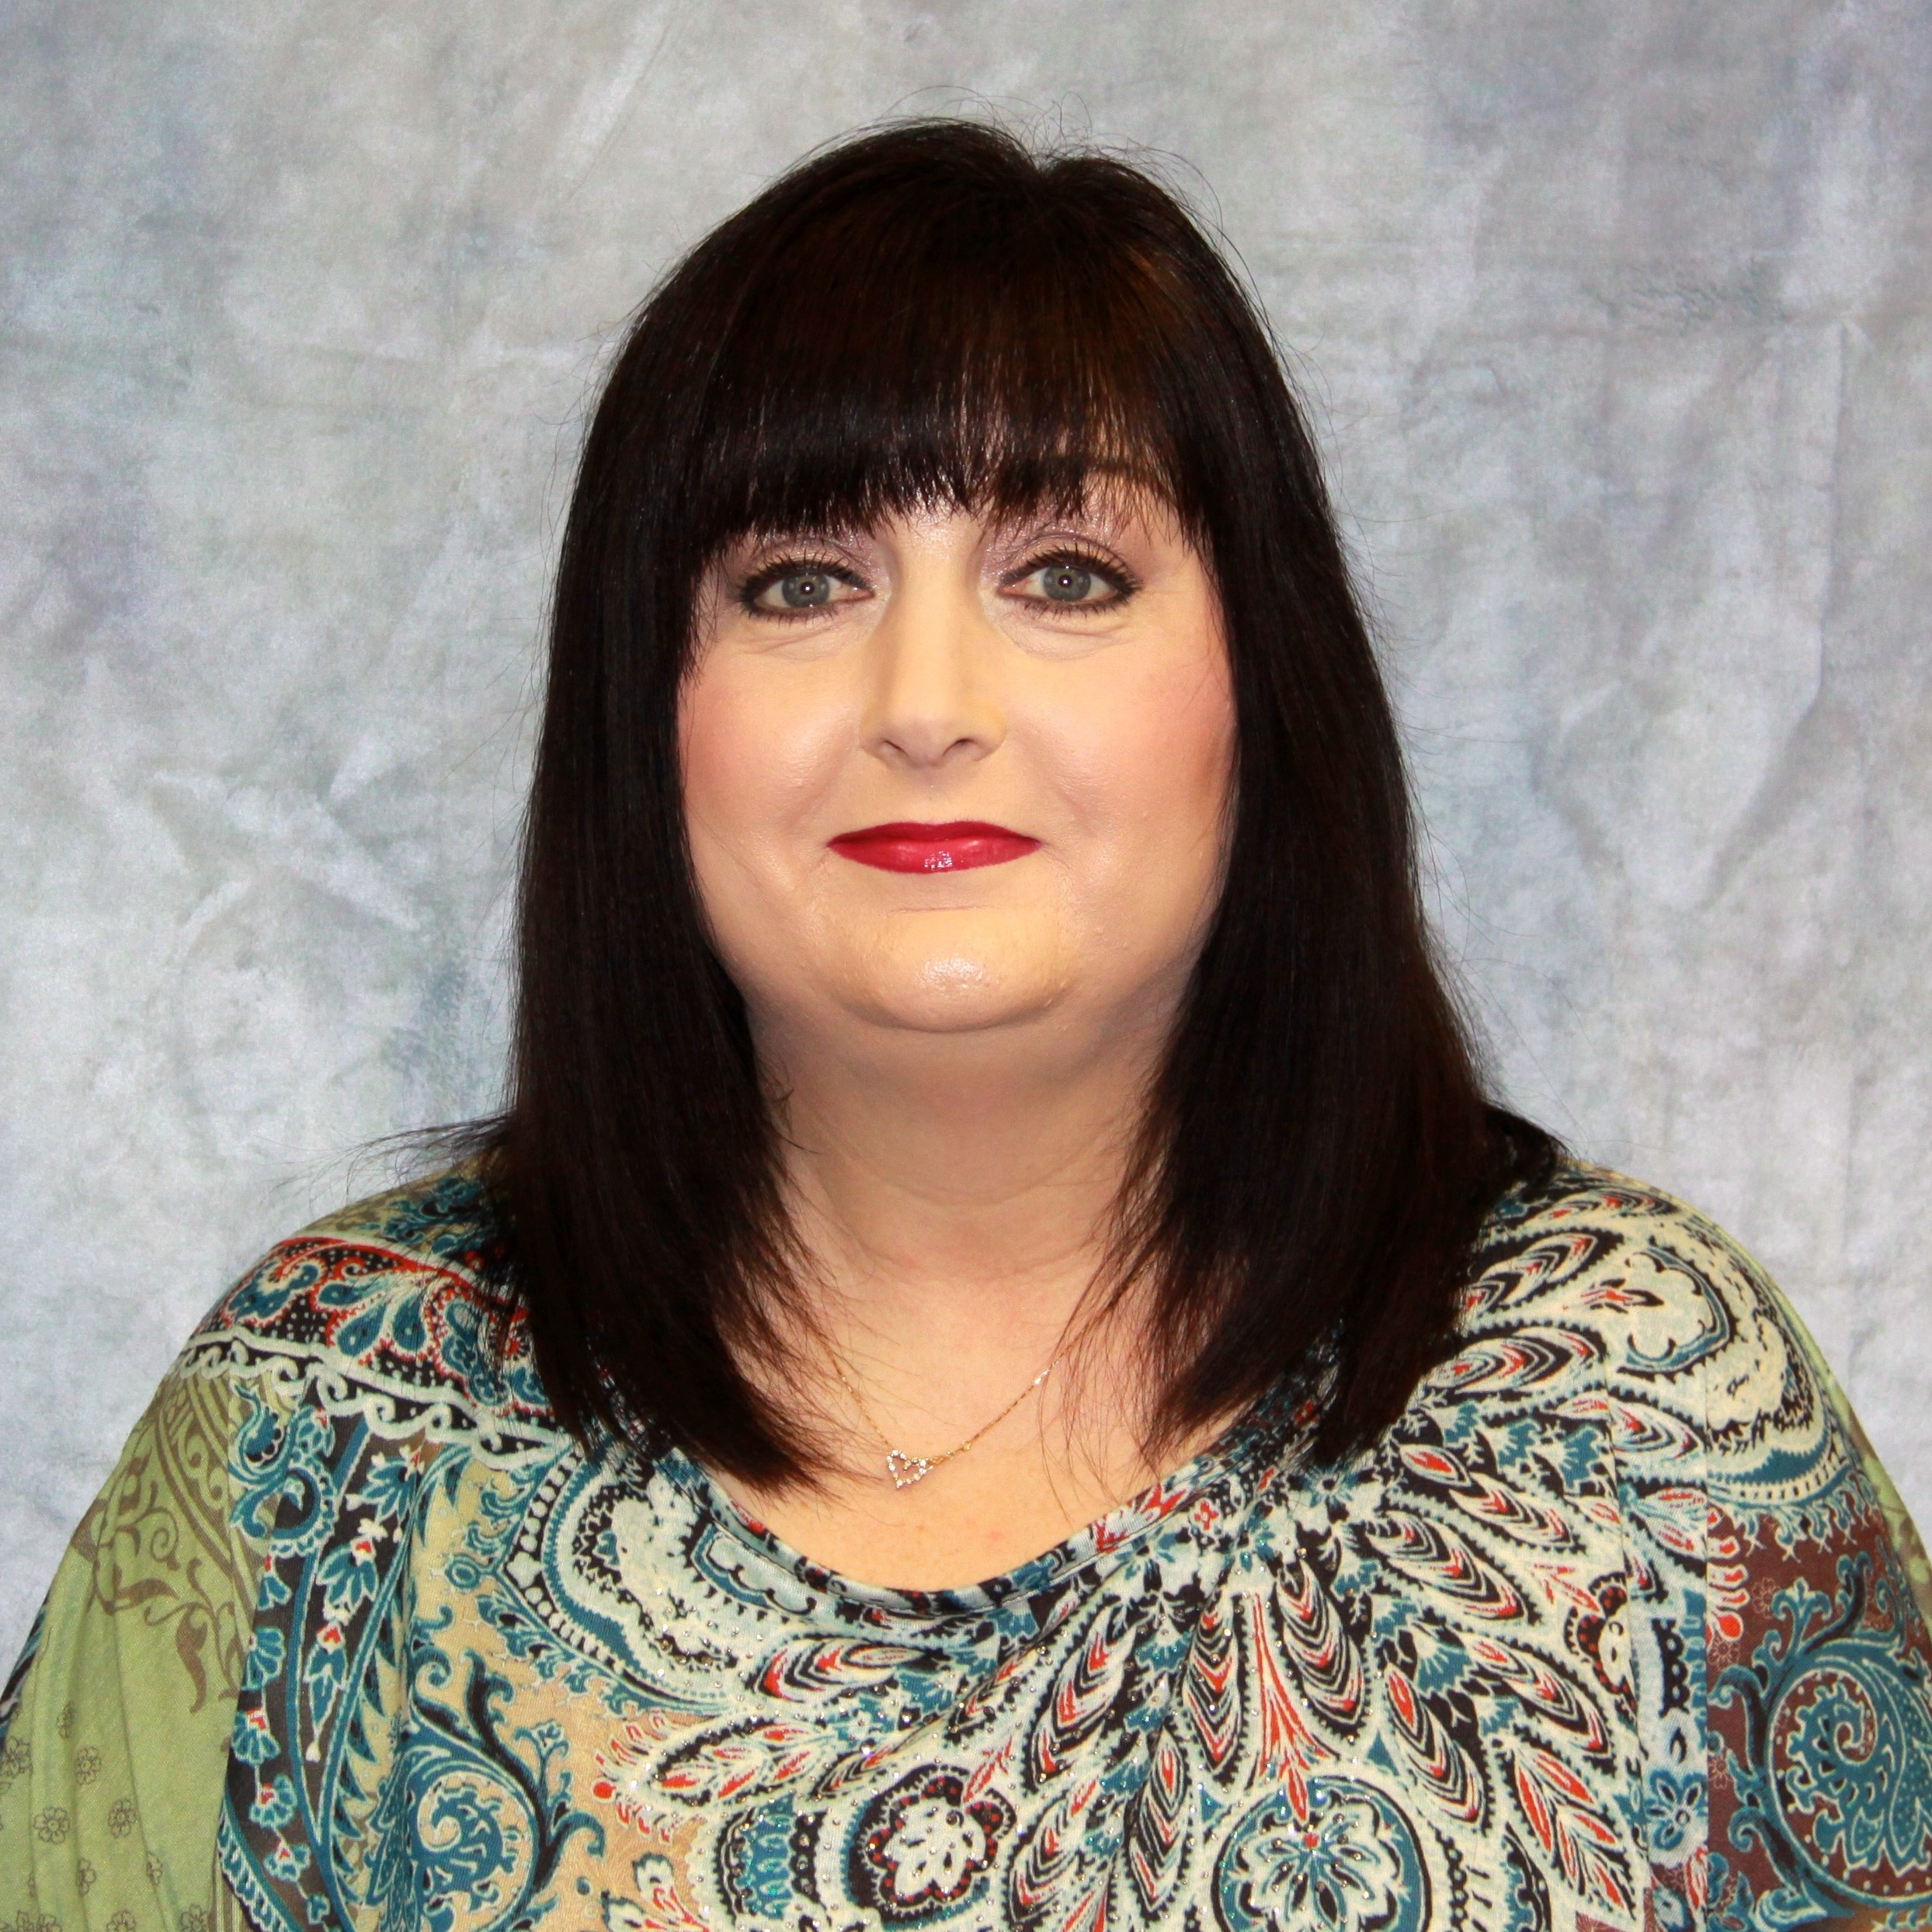 Kelley Hathaway Administrative Assistant khathaway@fwgoodshepherd.org